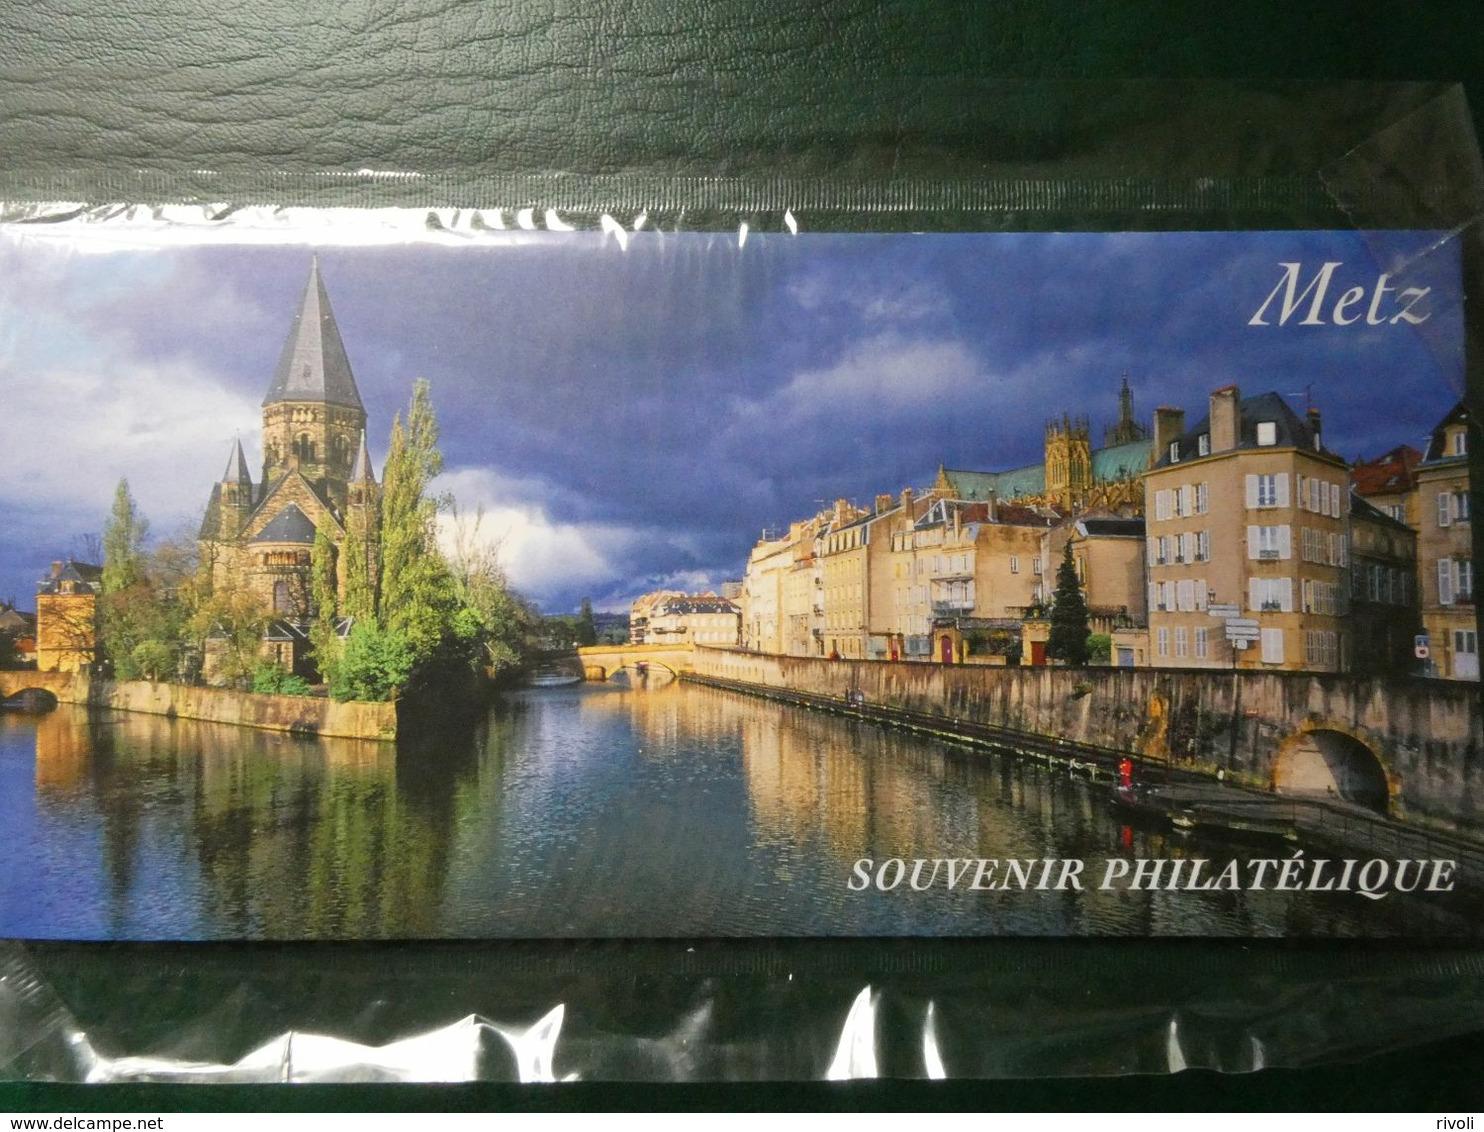 FRANCE 2012-BLOC SOUVENIR N° 75 METZ NEUF ** SOUS BLISTER D'ORIGINE - Foglietti Commemorativi